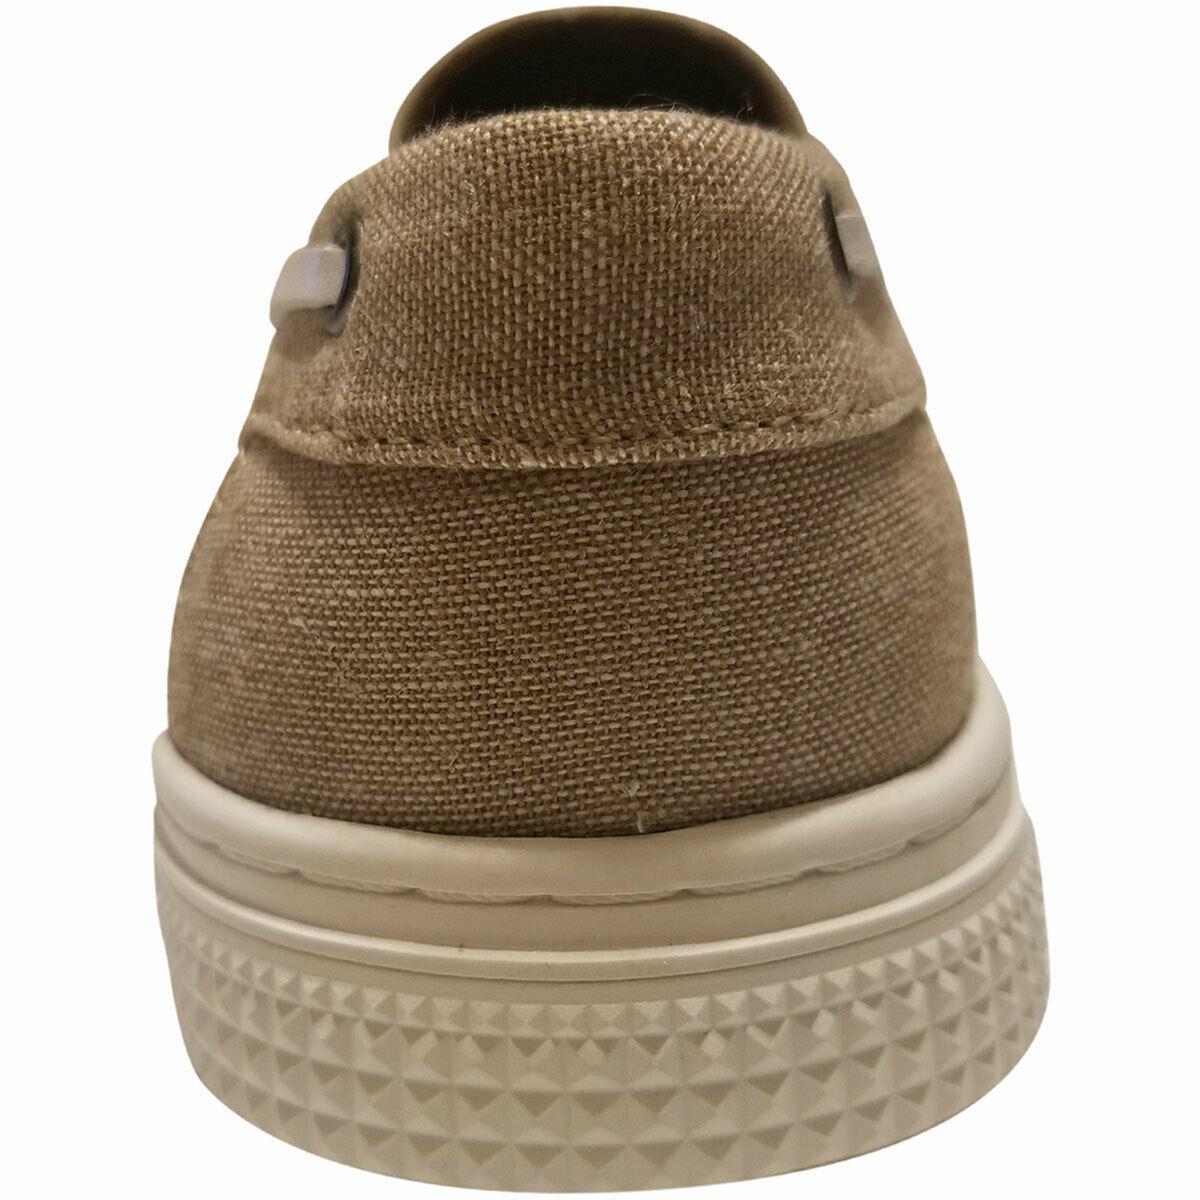 Kenneth Cole Reaction Men's Ankir Canvas Slip-on Boat Shoes Beige Sand 9.5 M ... image 3